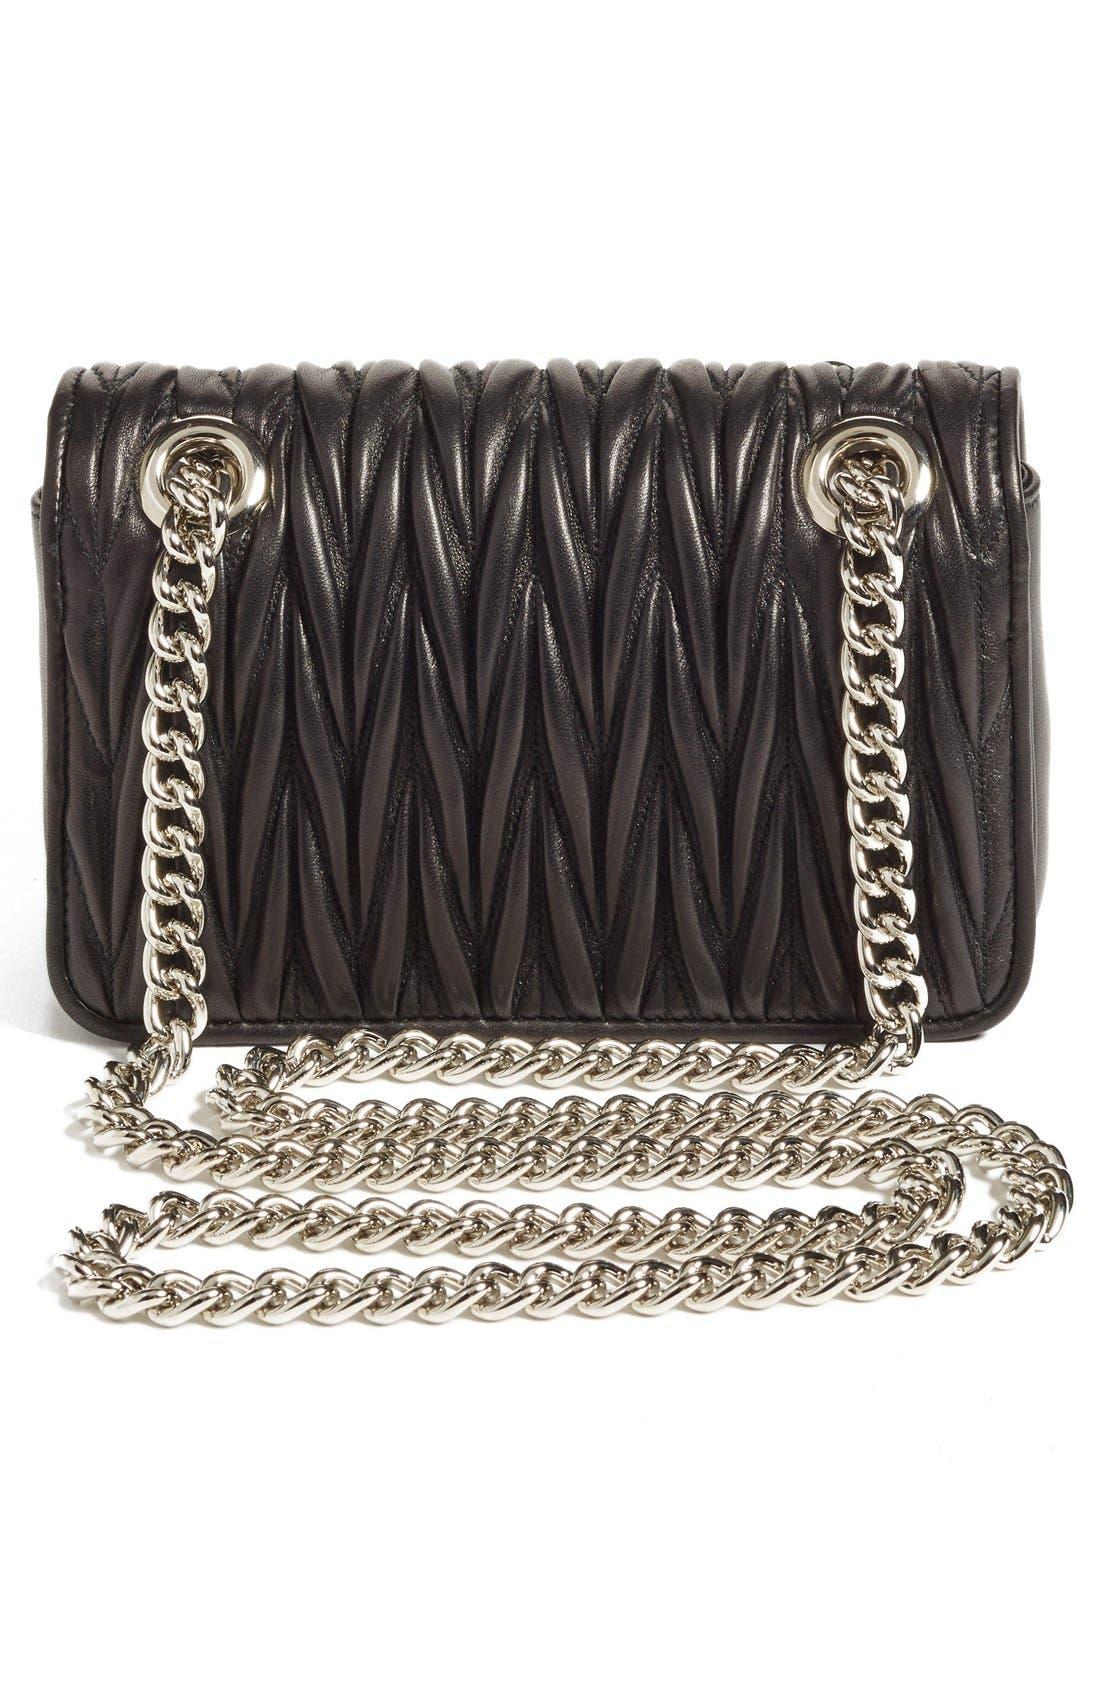 Small Matelassé Leather Shoulder Bag,                             Alternate thumbnail 3, color,                             Nero